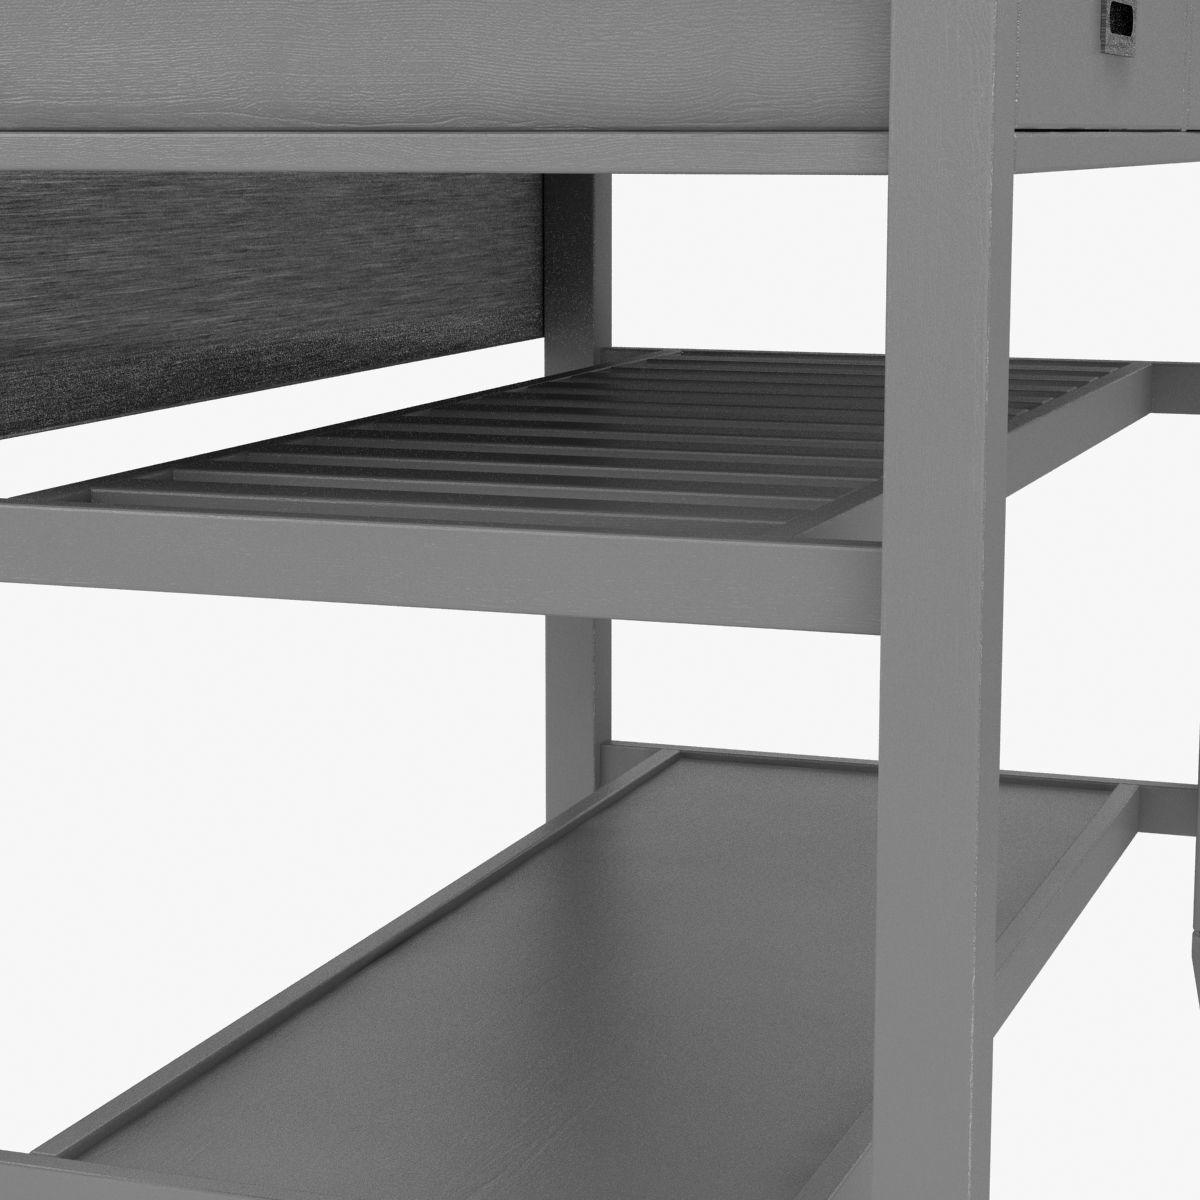 Crate abd barrel sheridan grey kitchen island 3d model max obj mtl 3ds fbx stl unitypackage